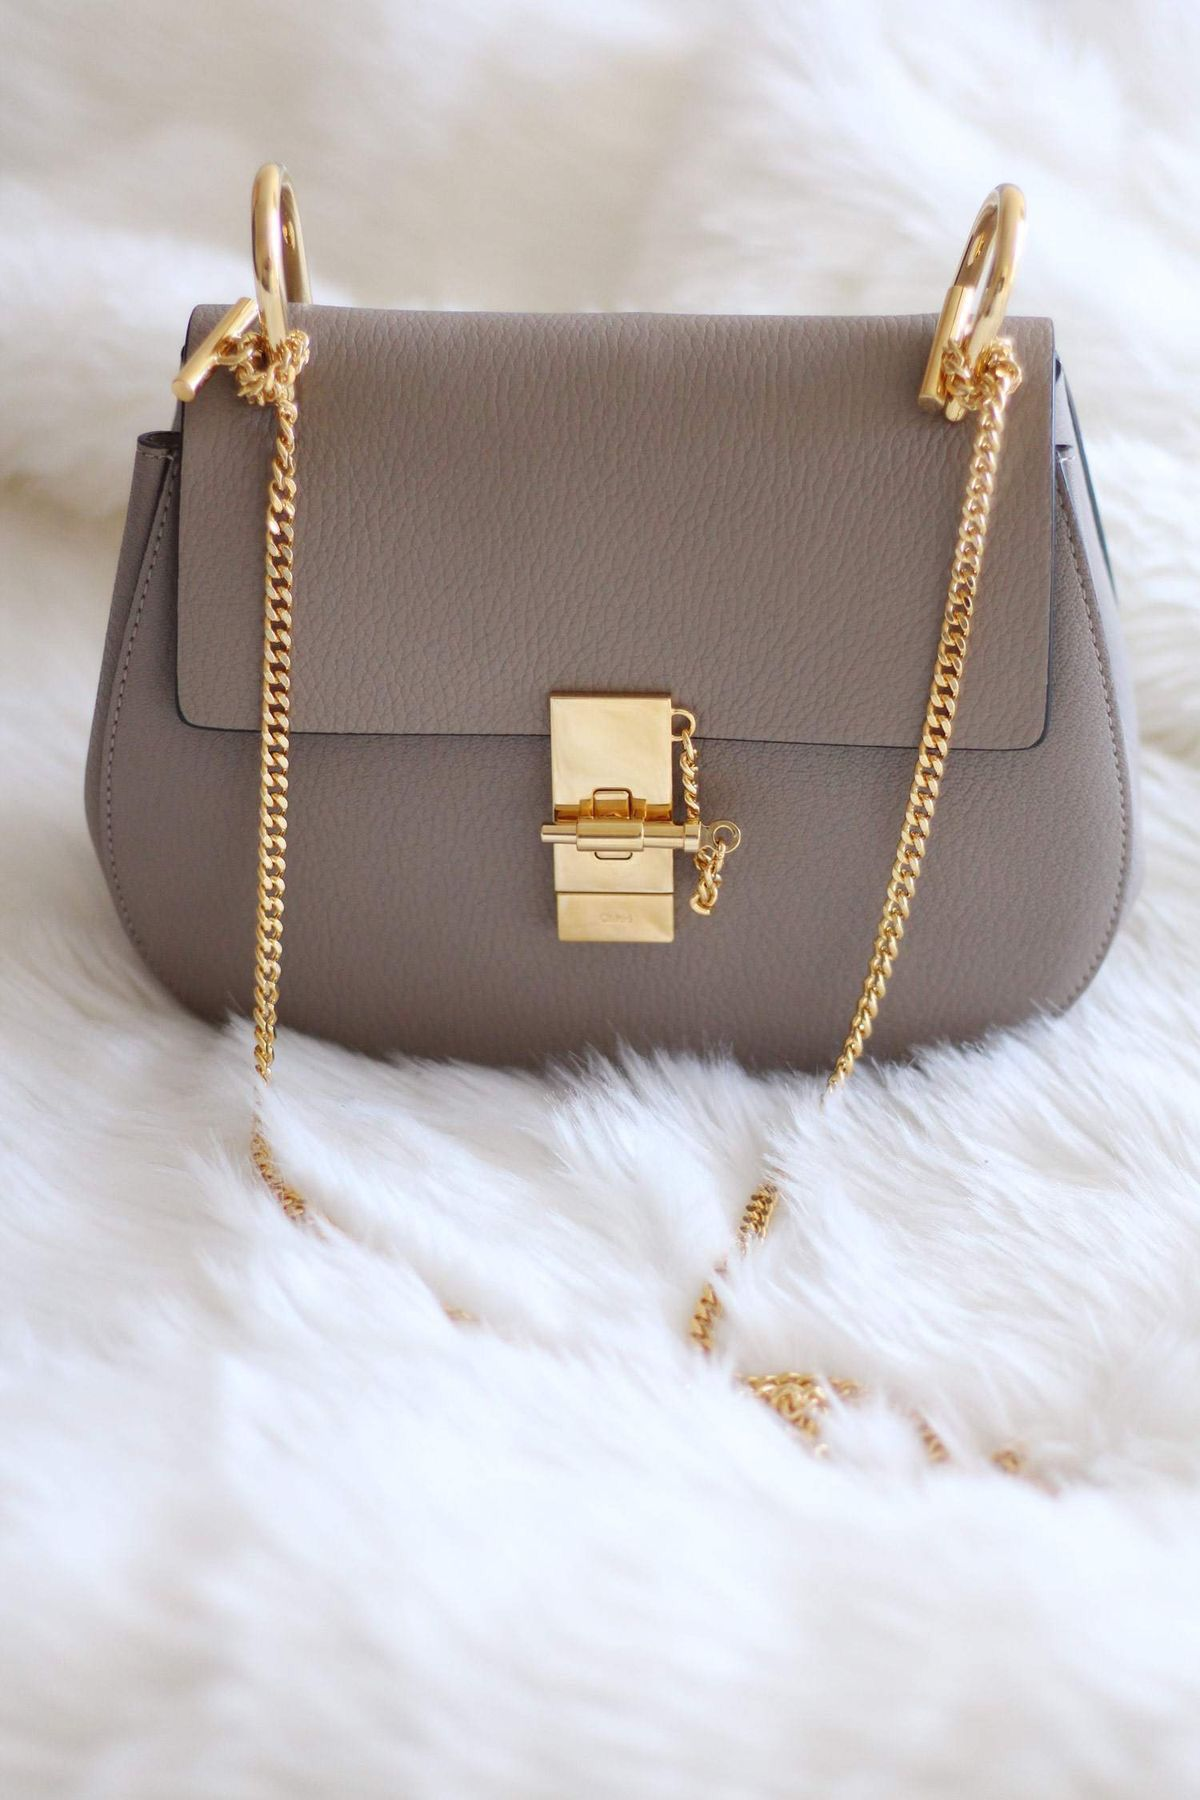 Top Handle Handbag, Yellow, Leather, 2017, one size Chloé